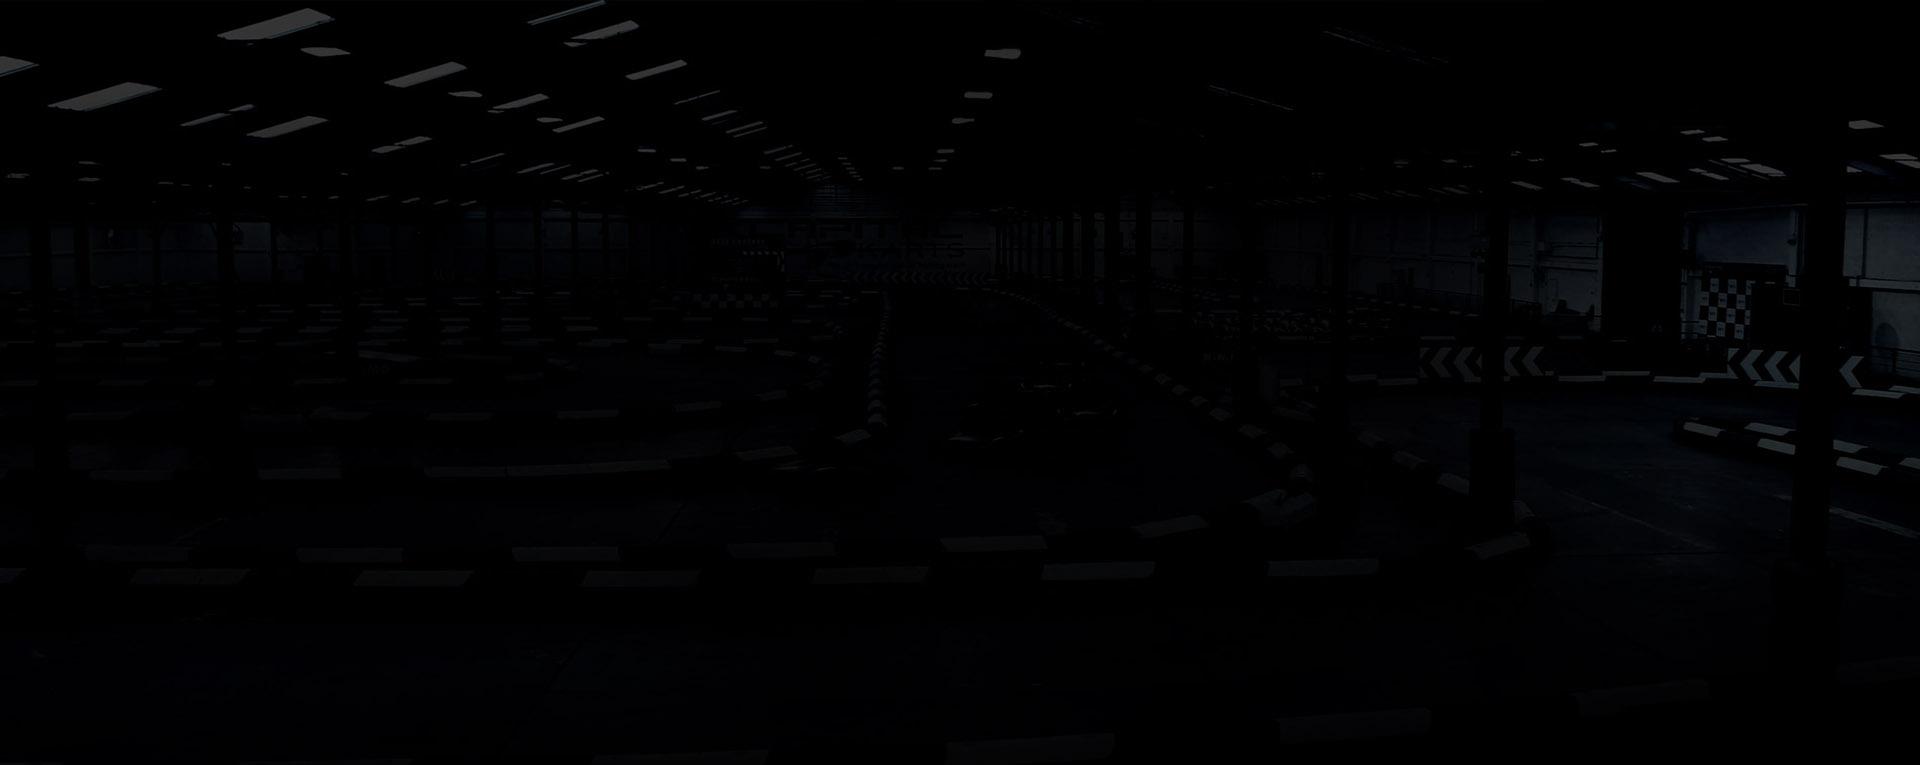 Bobby Rahal - Termination - BOBBY RAHAL AUTOMOTIVE GROUP